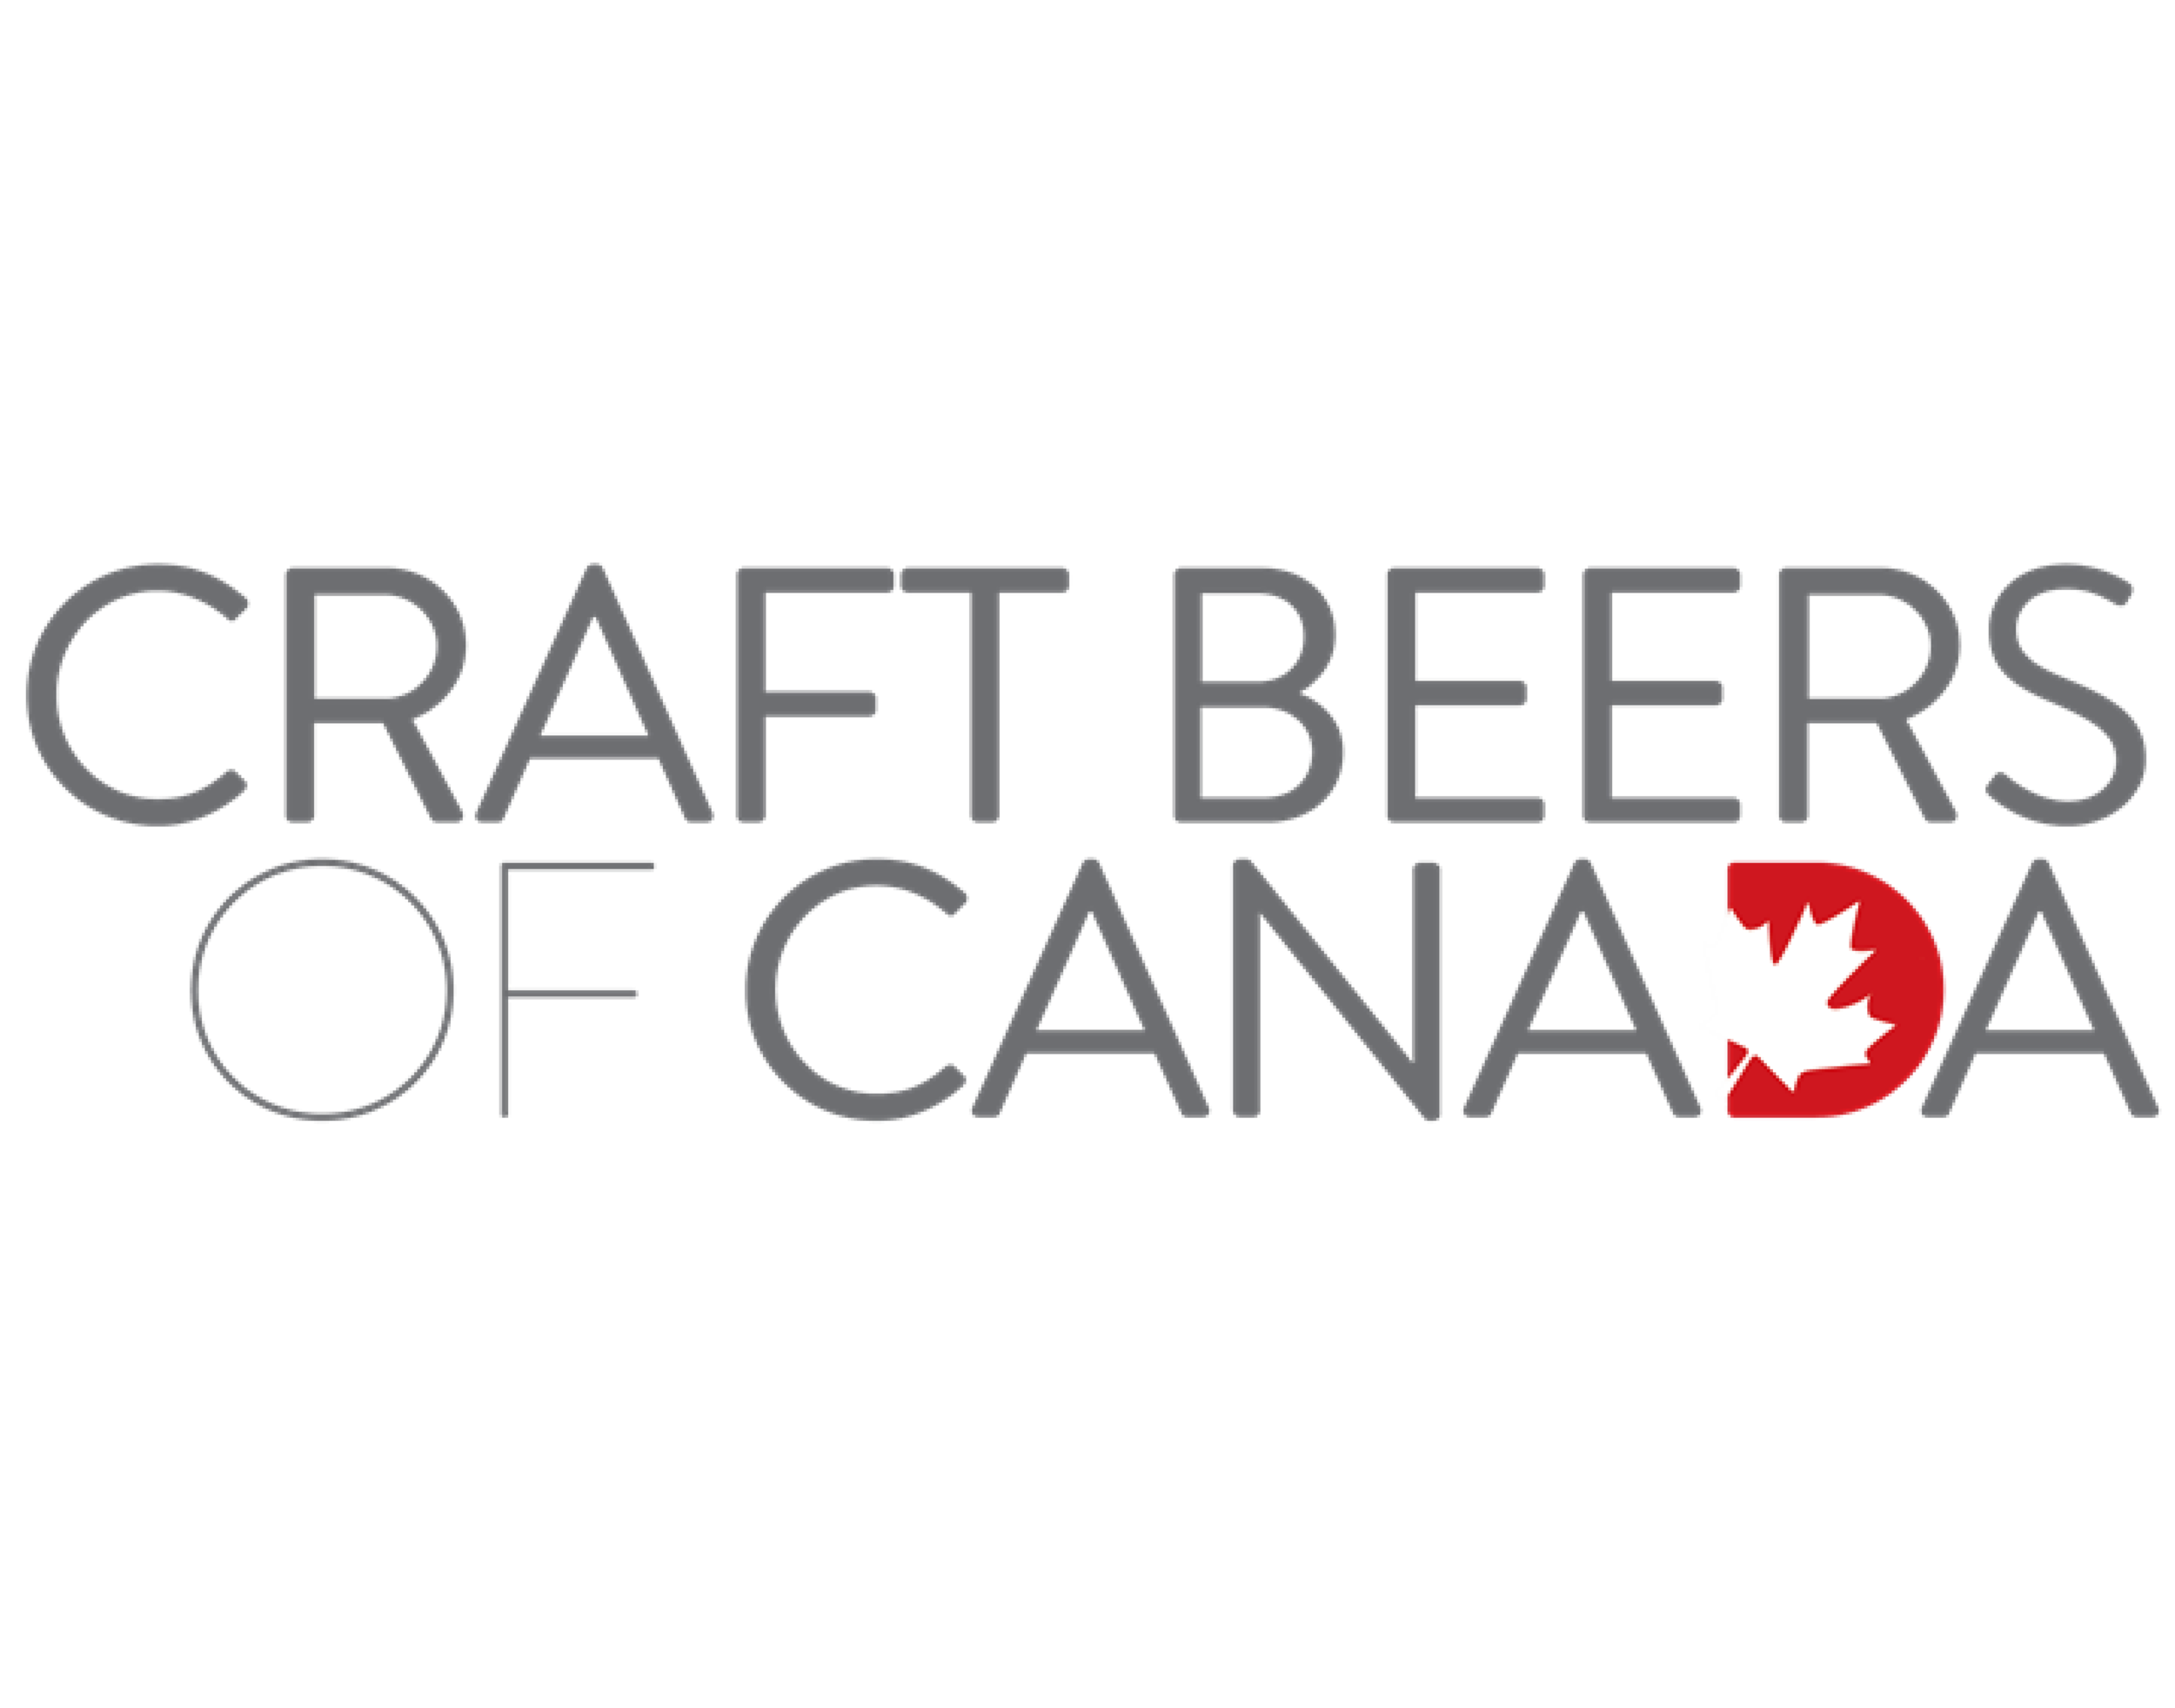 Craft Beers of Canada logo. Links to Craft Beers of Canada website.